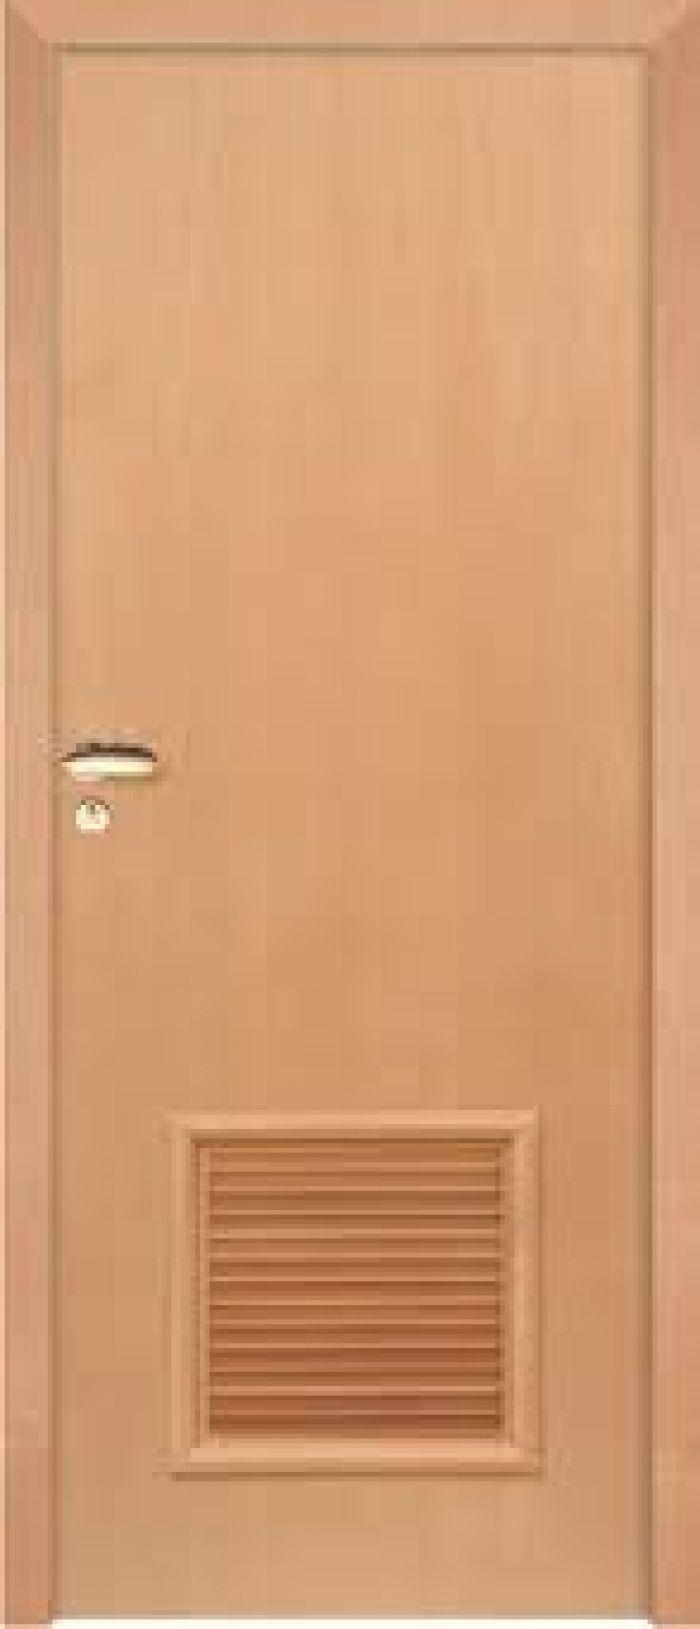 Porta interna lisa pralaca verniz 60 70 80 x 210 entrega 3 for Porta 1 20